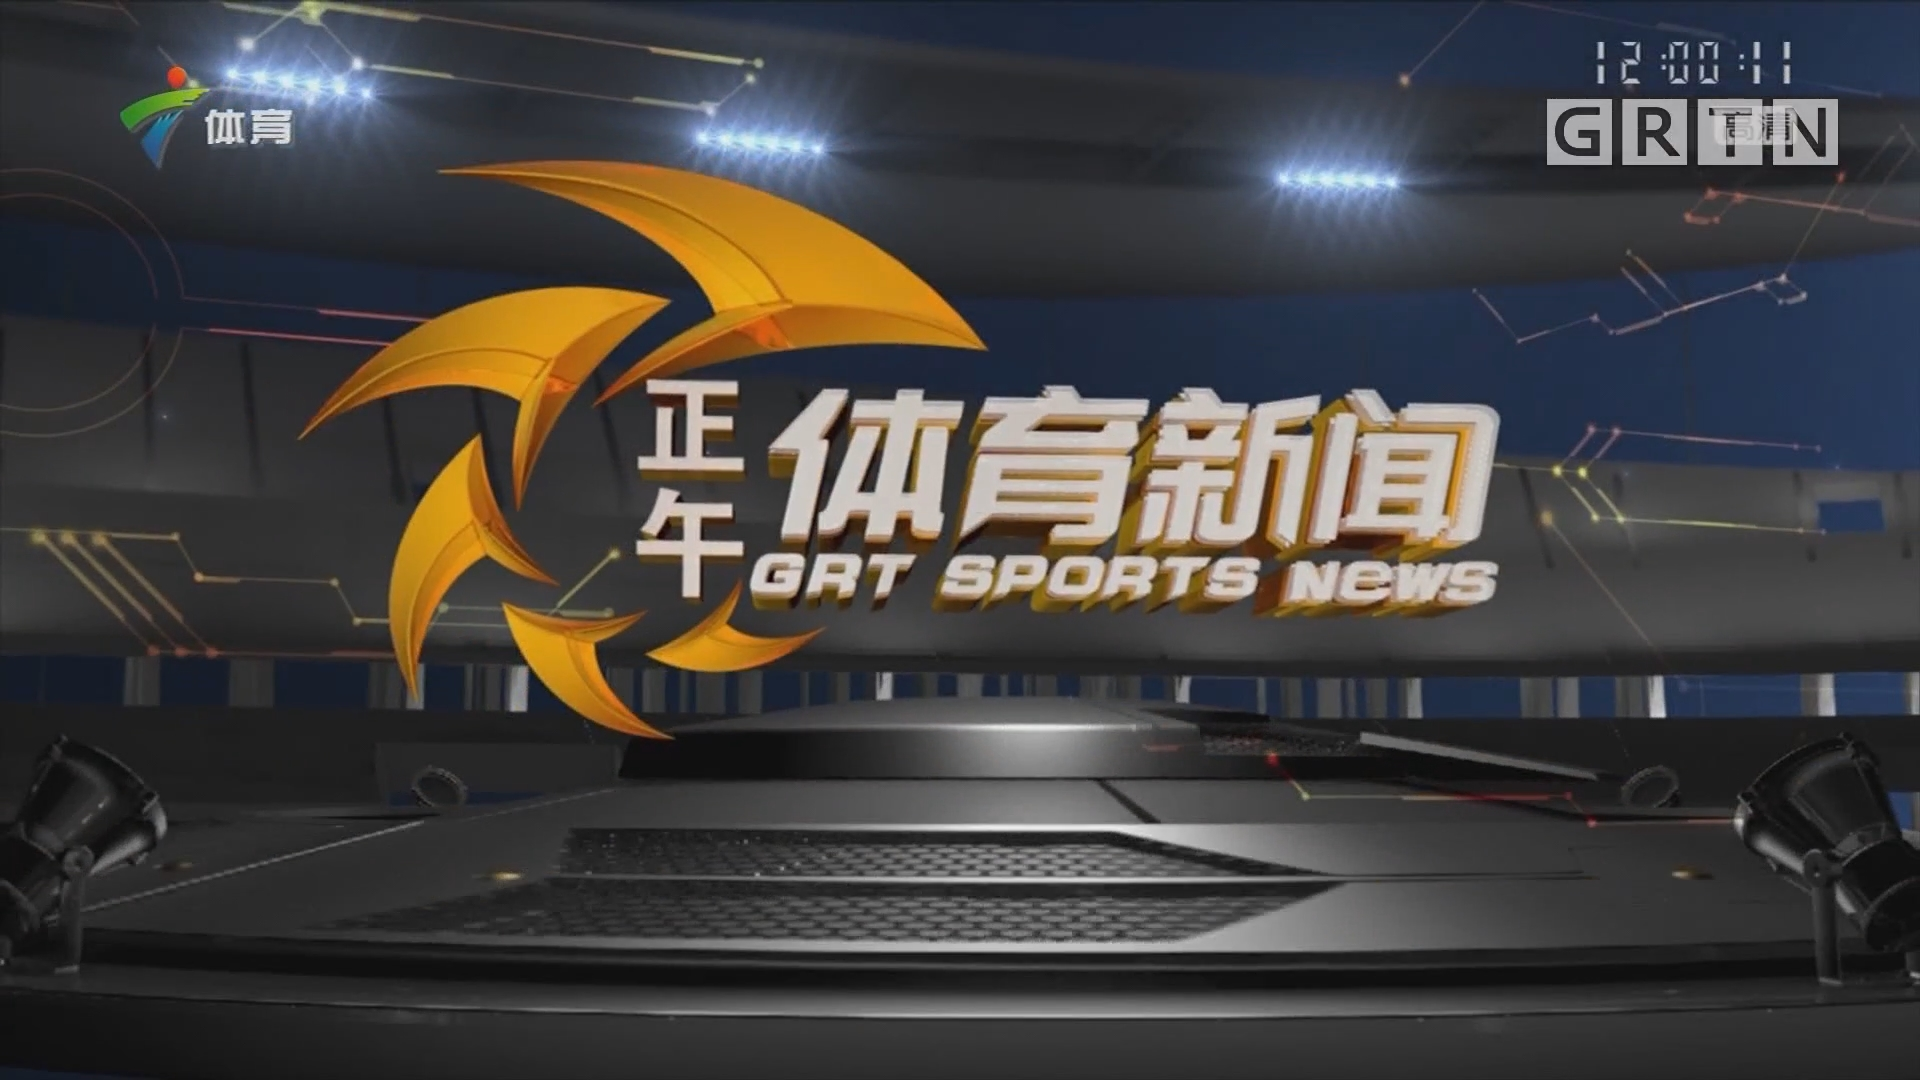 [HD][2019-04-08]正午体育新闻:约基奇、穆雷缺阵 掘金客场不敌开拓者